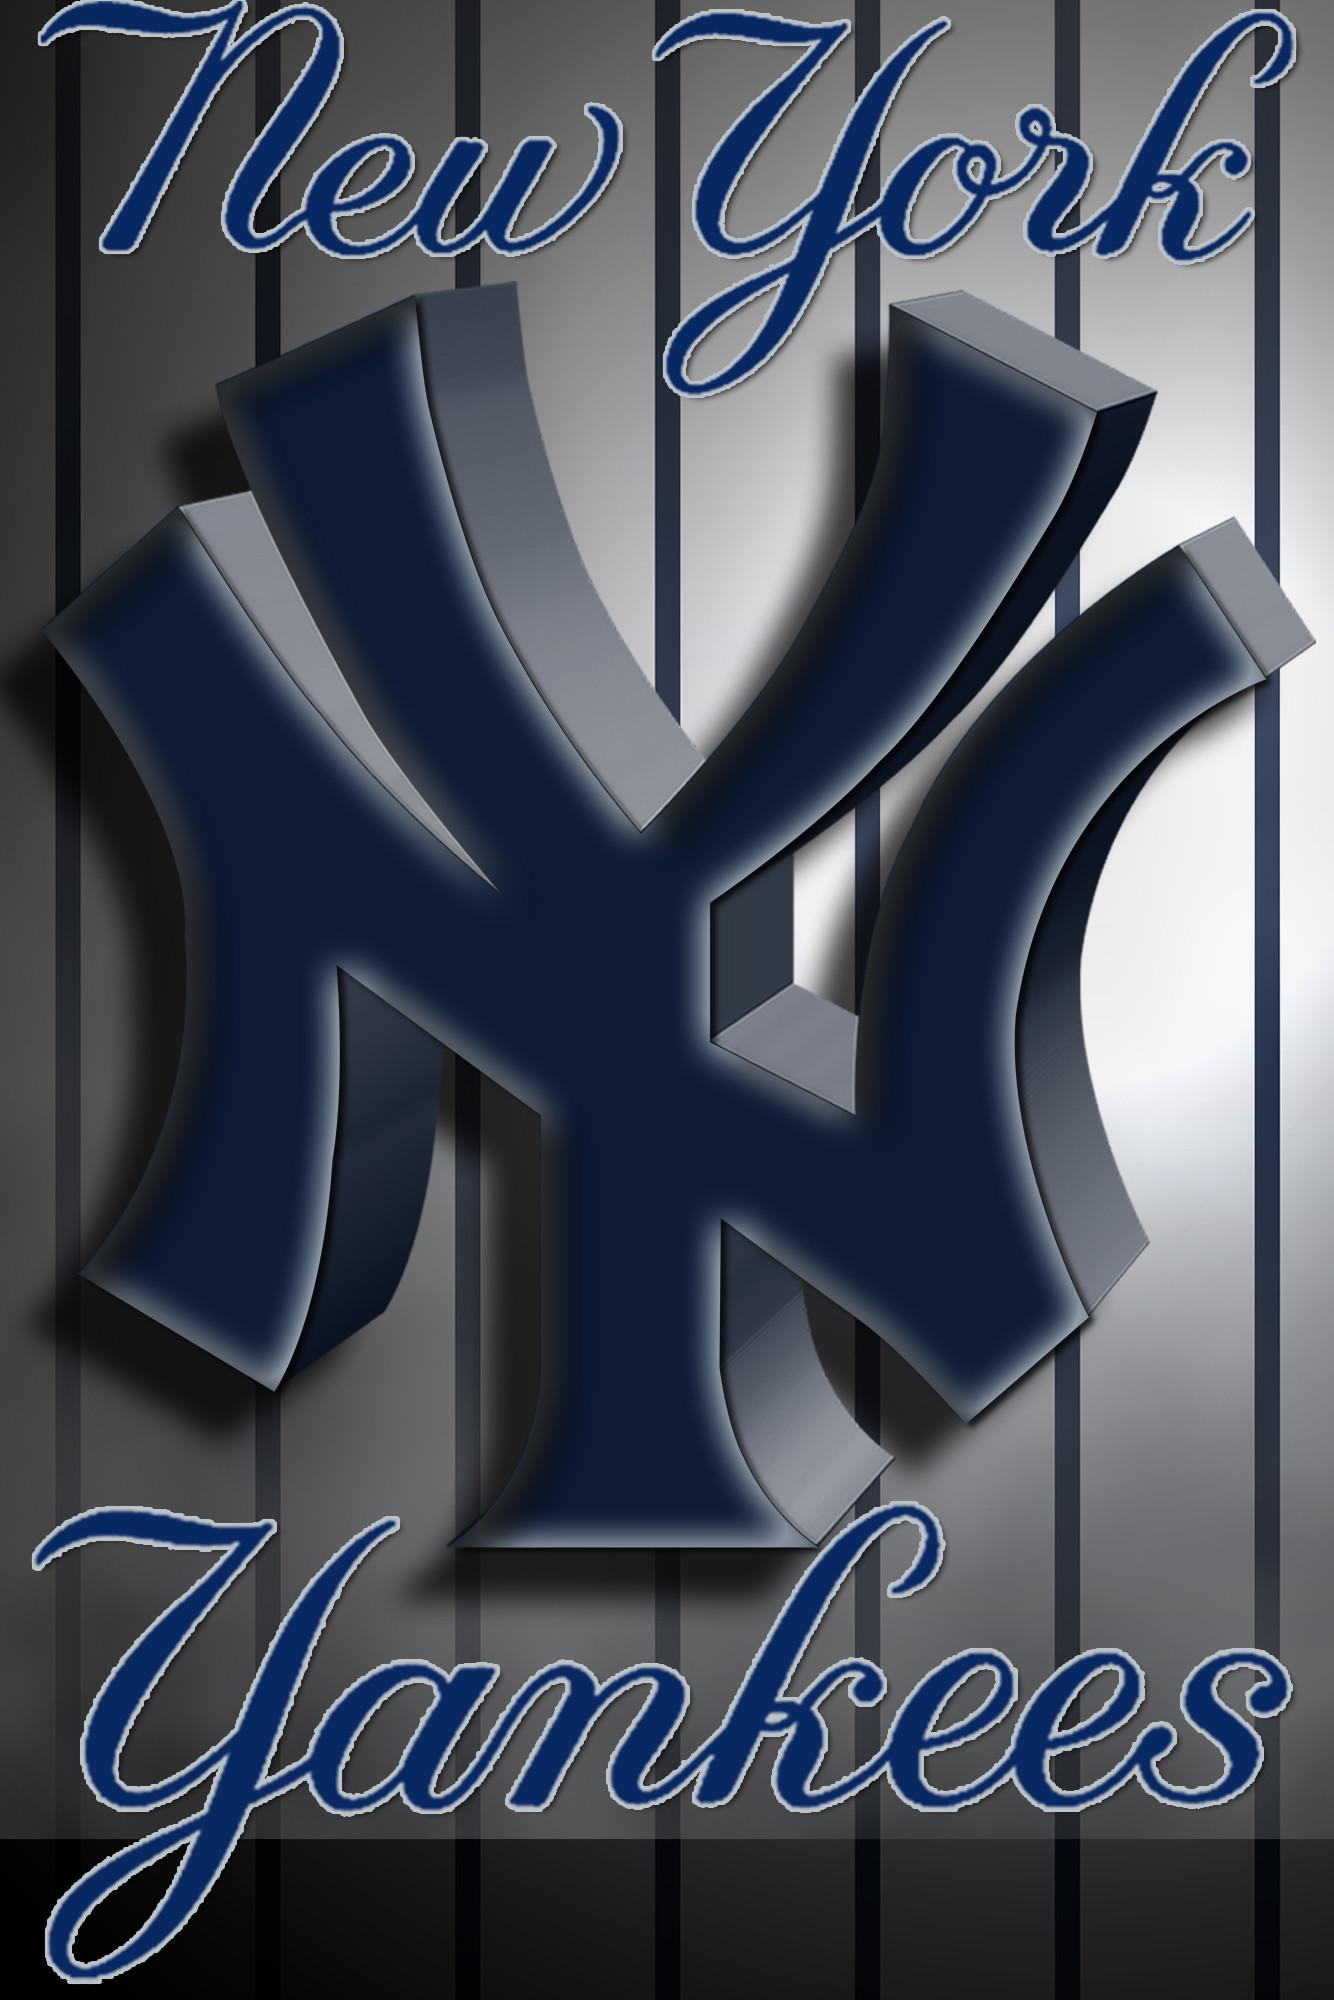 Yankees Wallpaper For Iphone Iphone 1-4,